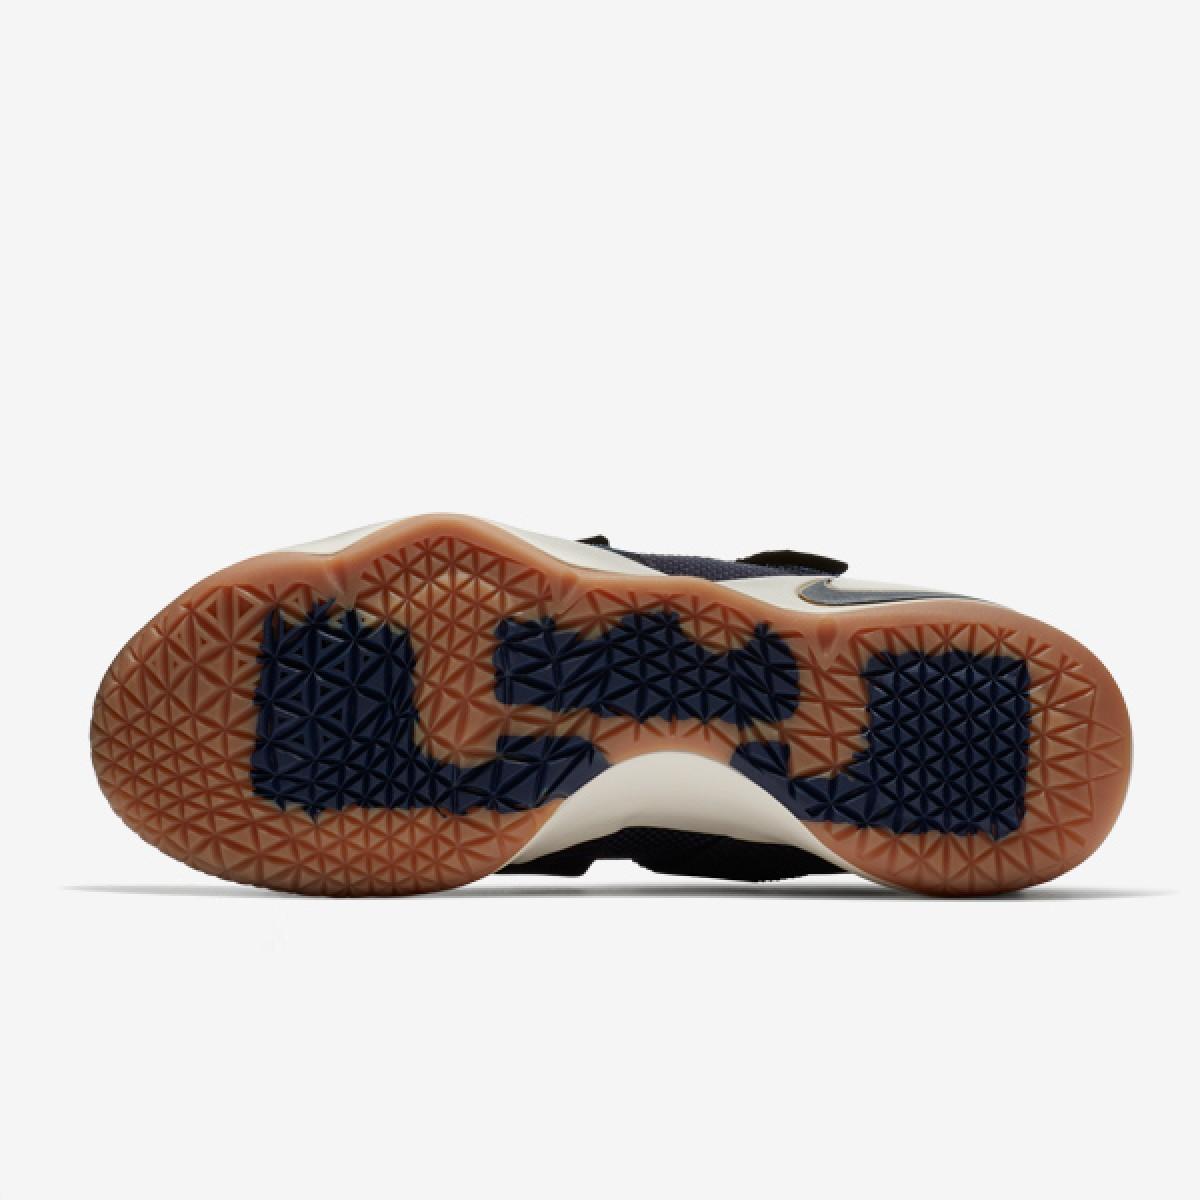 Nike Lebron Soldier XI 'Cavs' 897644-402